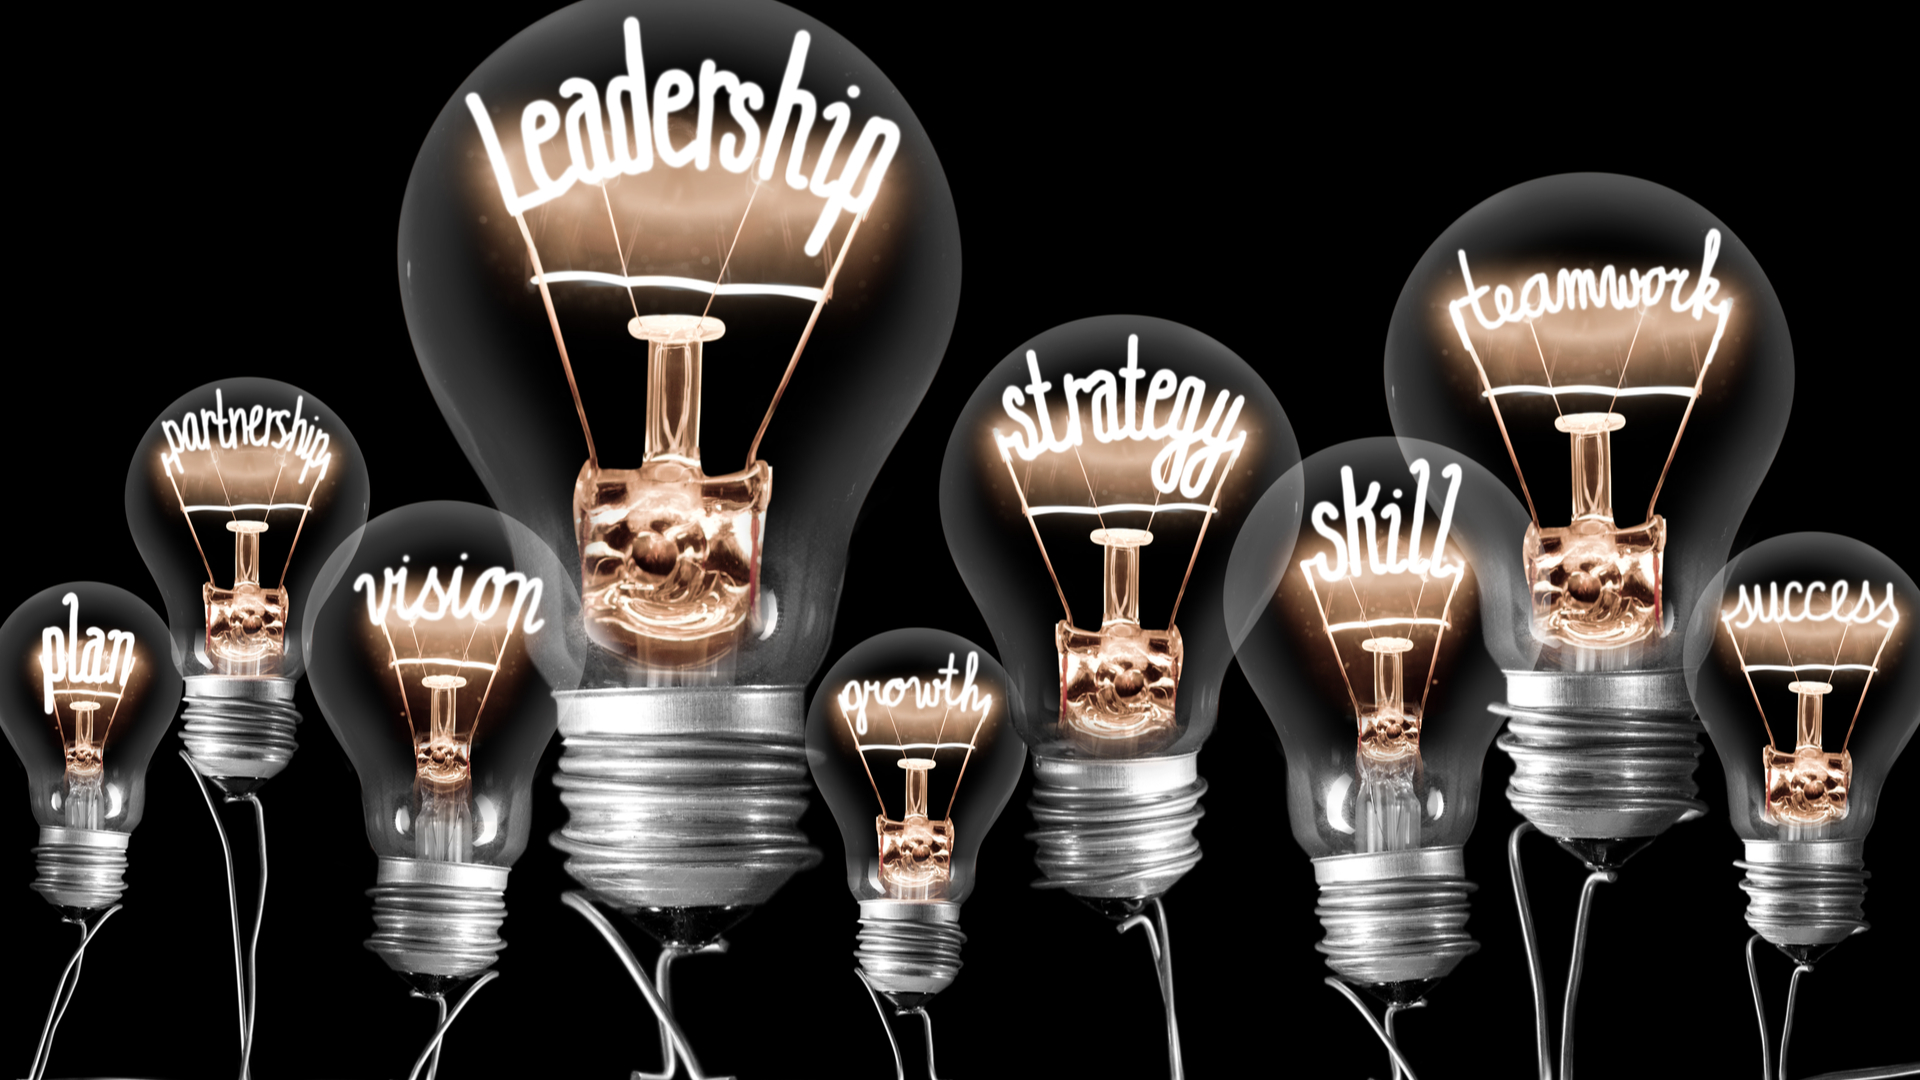 Leadership リーダーシップ